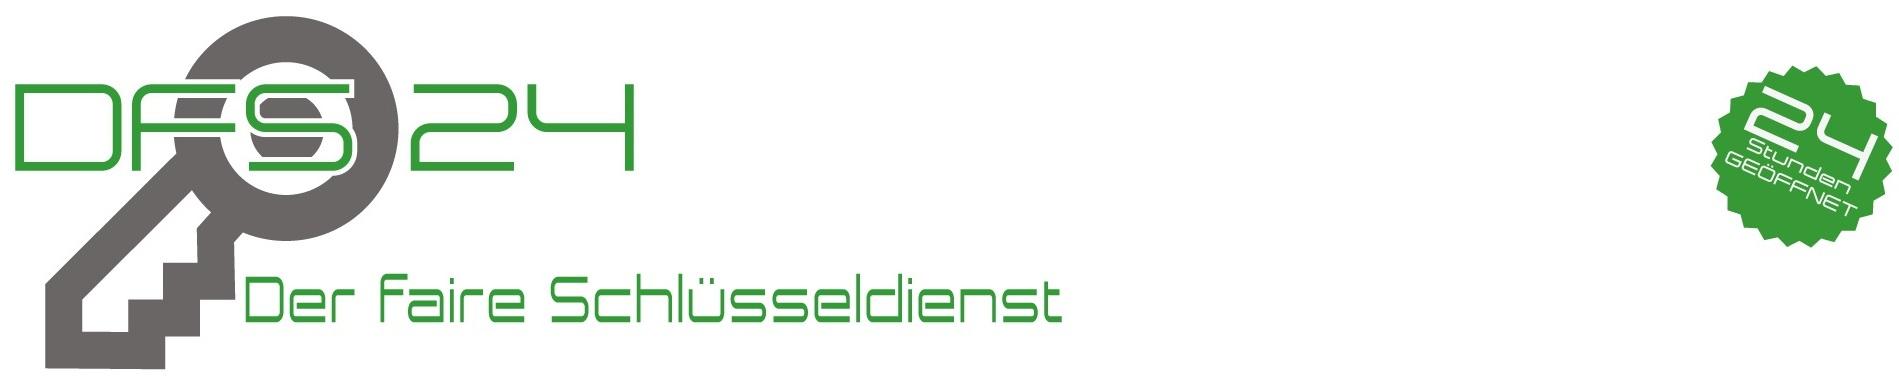 schlüsseldienst raesfeld logo